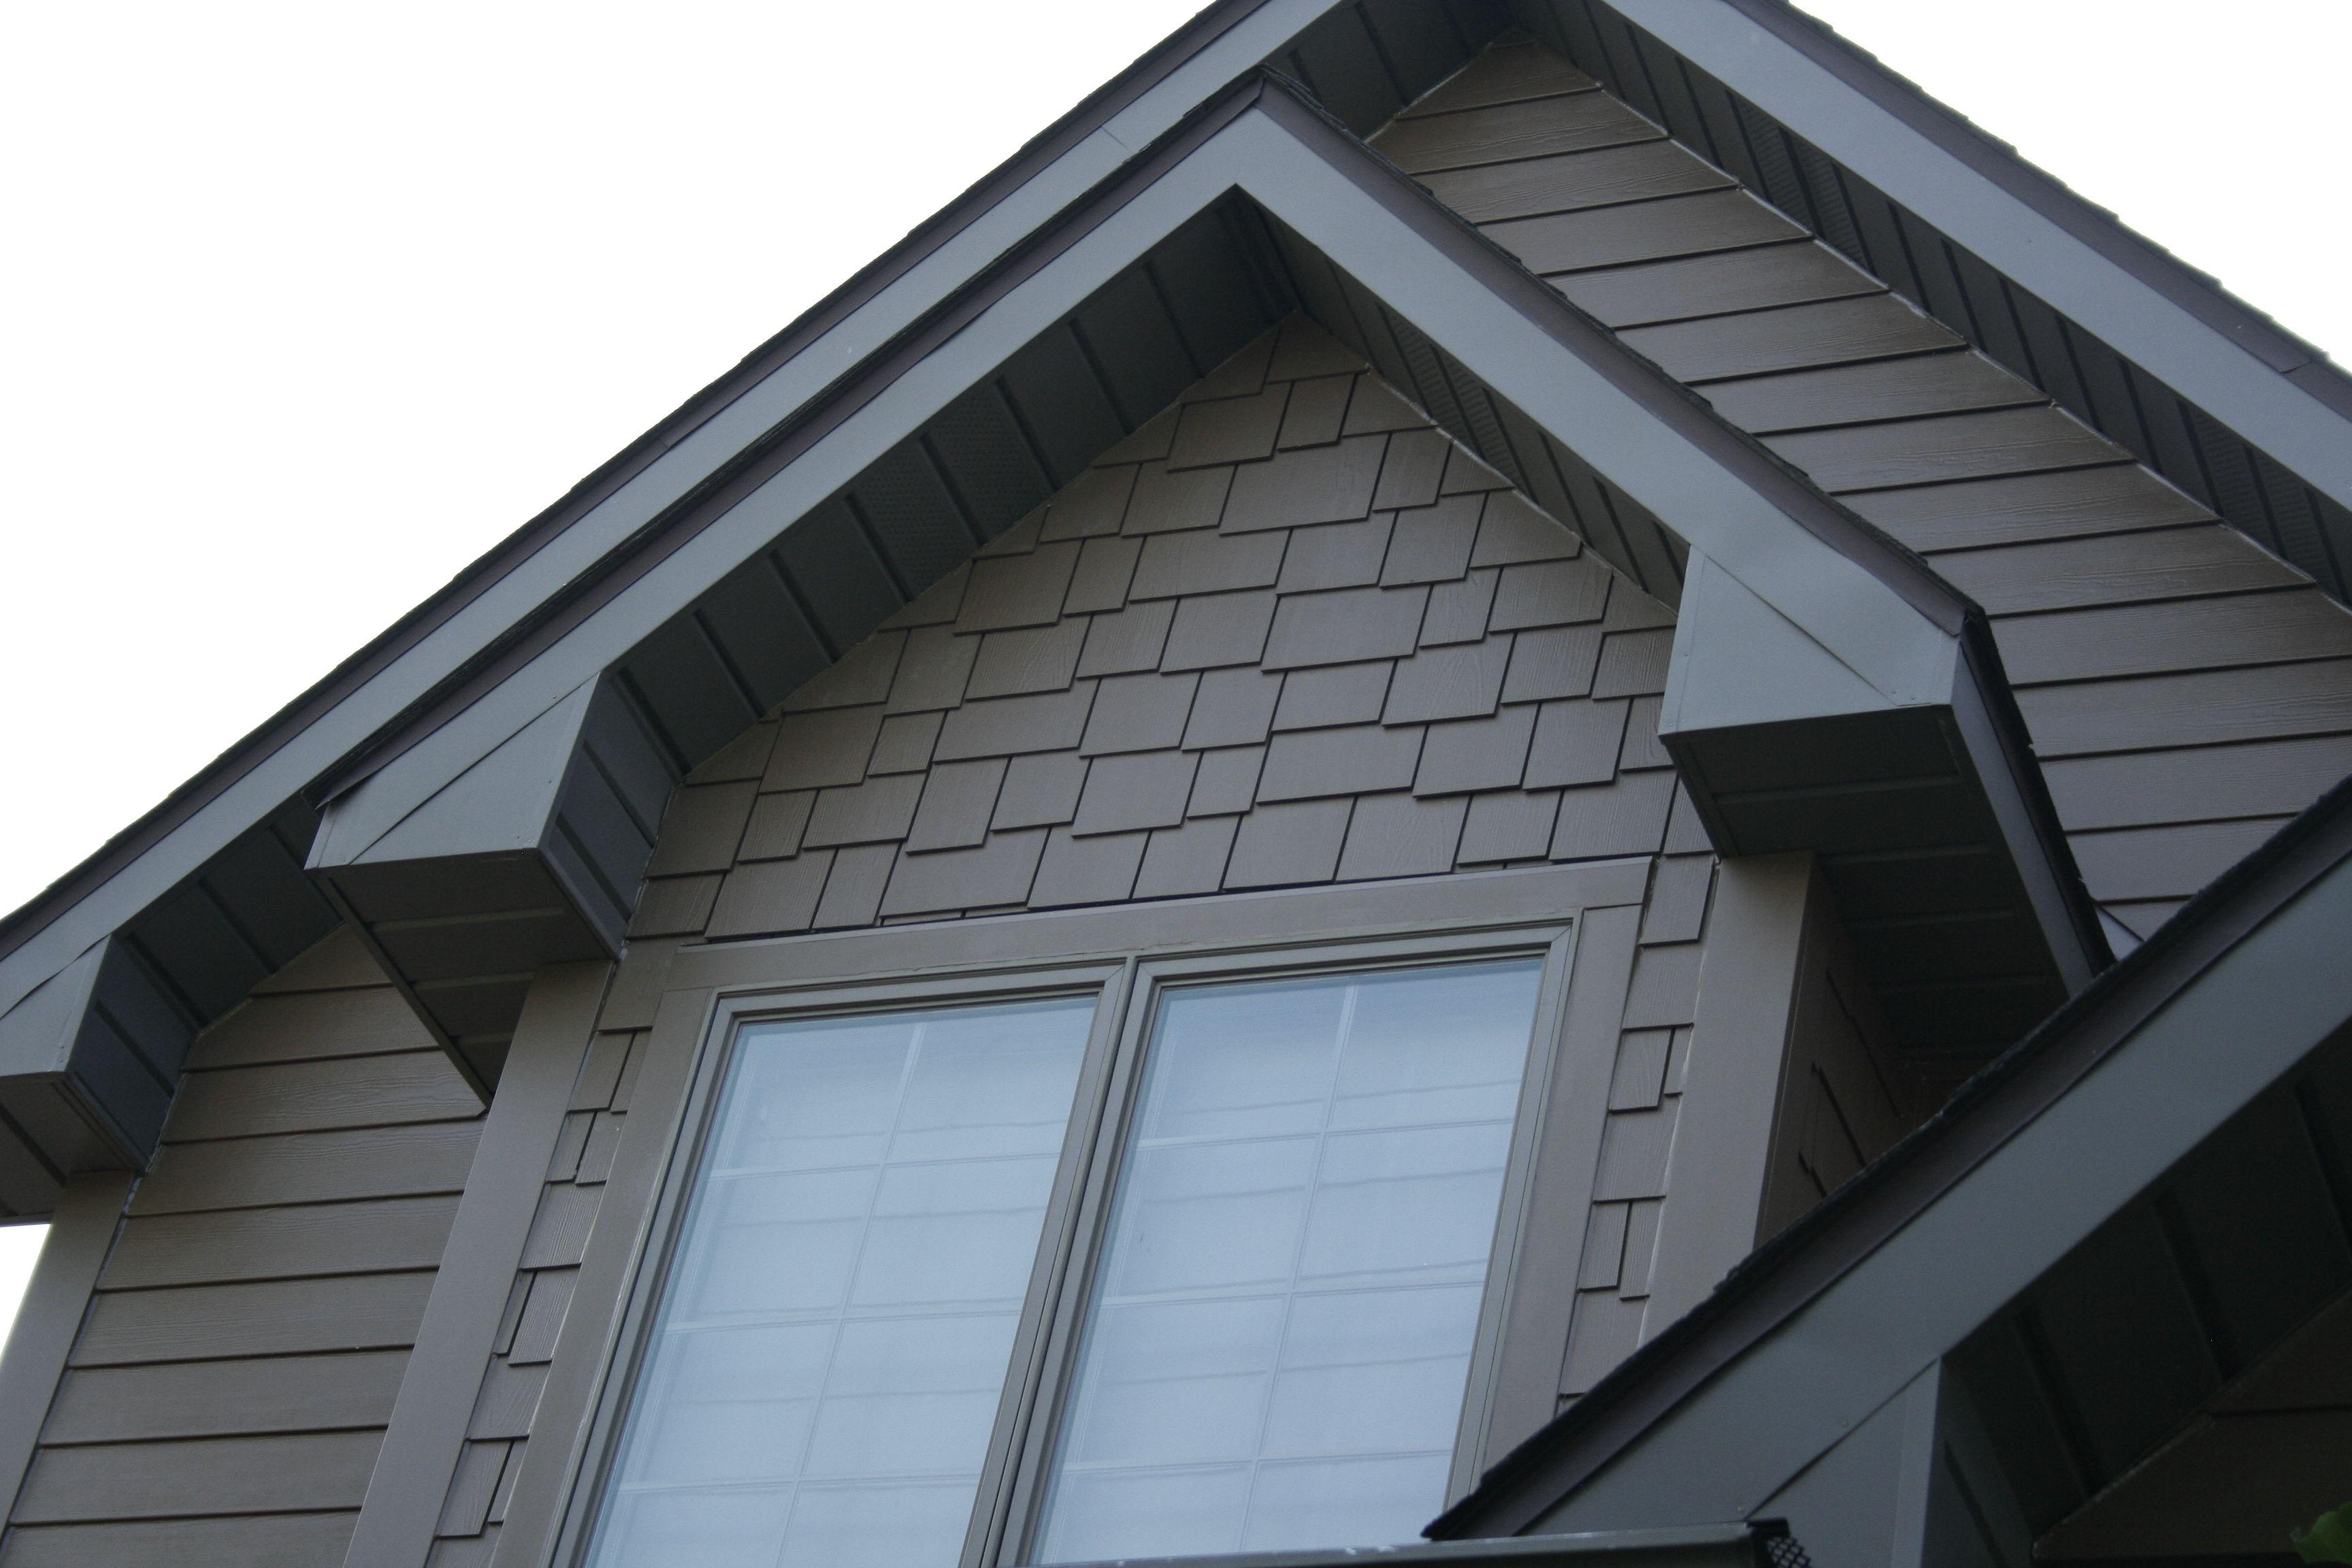 Siding Windows Roofing Contractors Naperville Il Shingle Siding Hardie Siding Siding